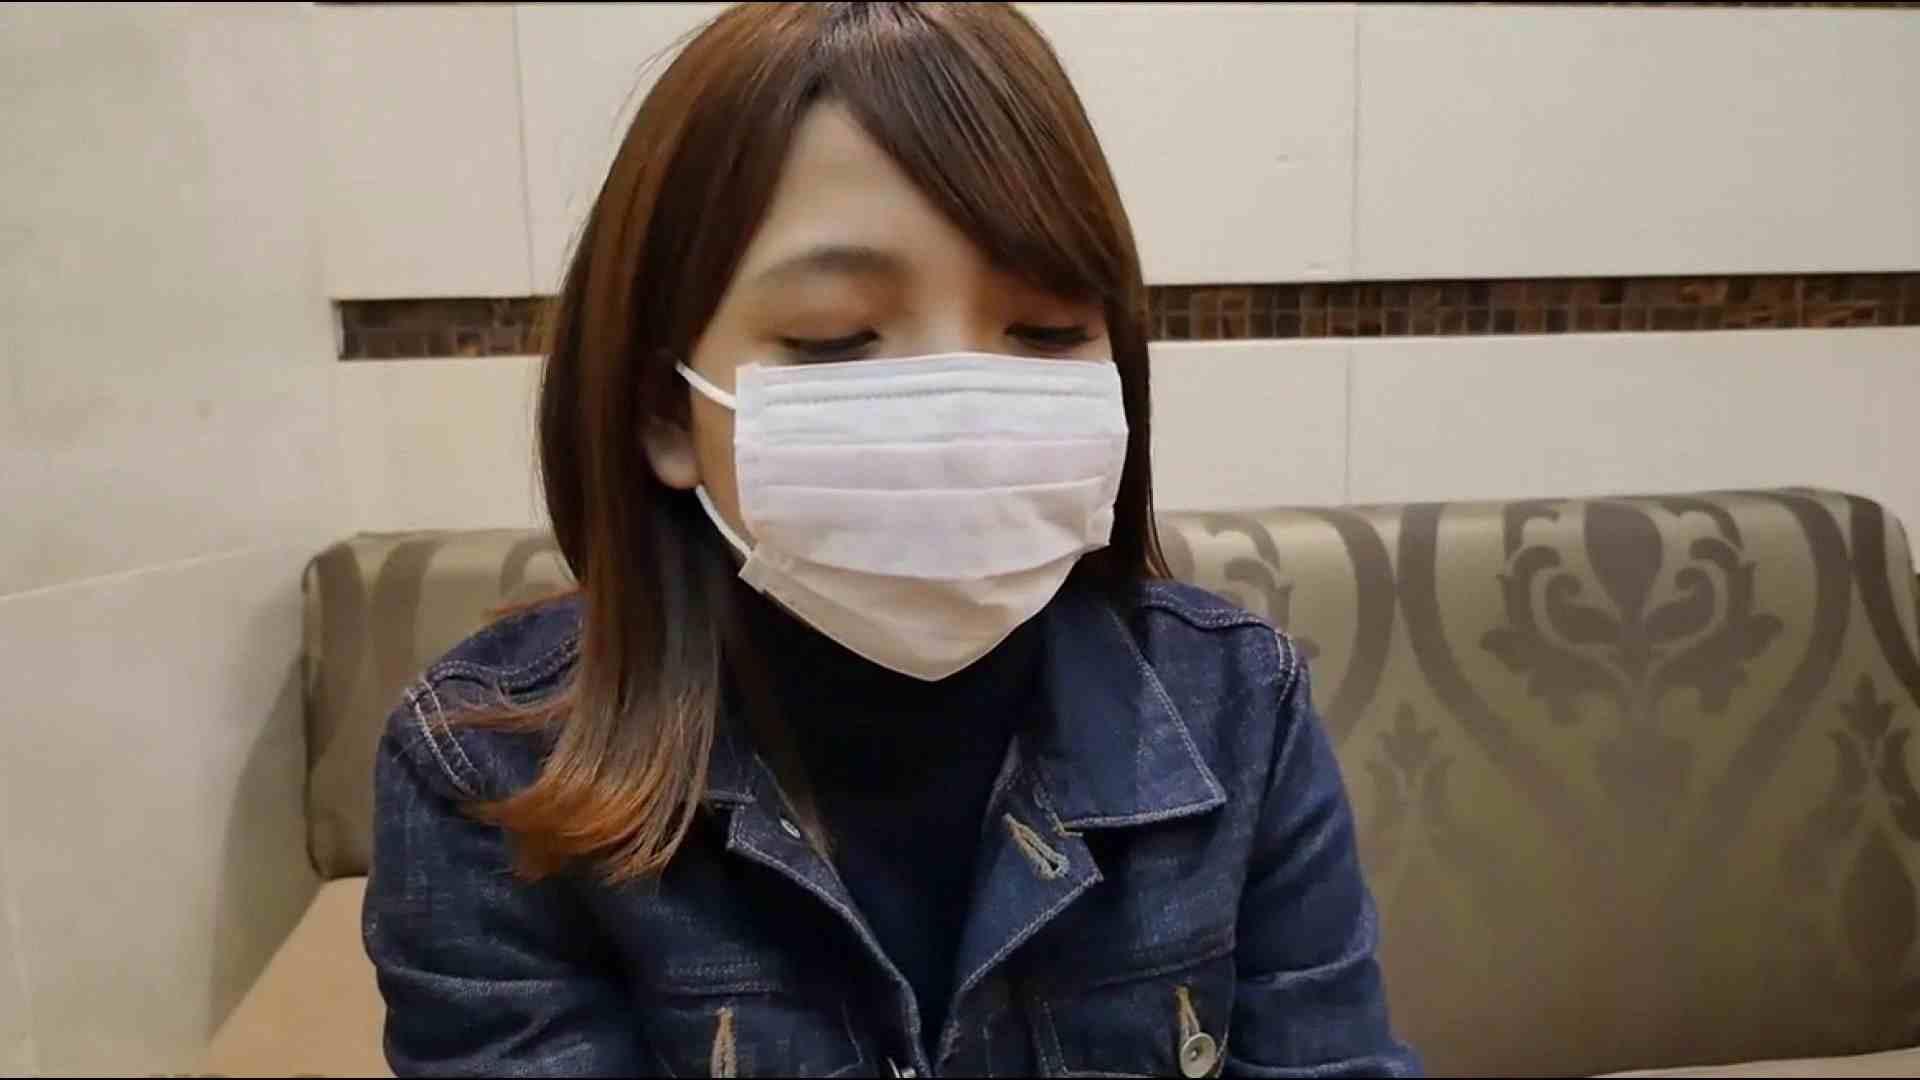 S級厳選美女ビッチガールVol.41 前編 OL女体  105連発 30